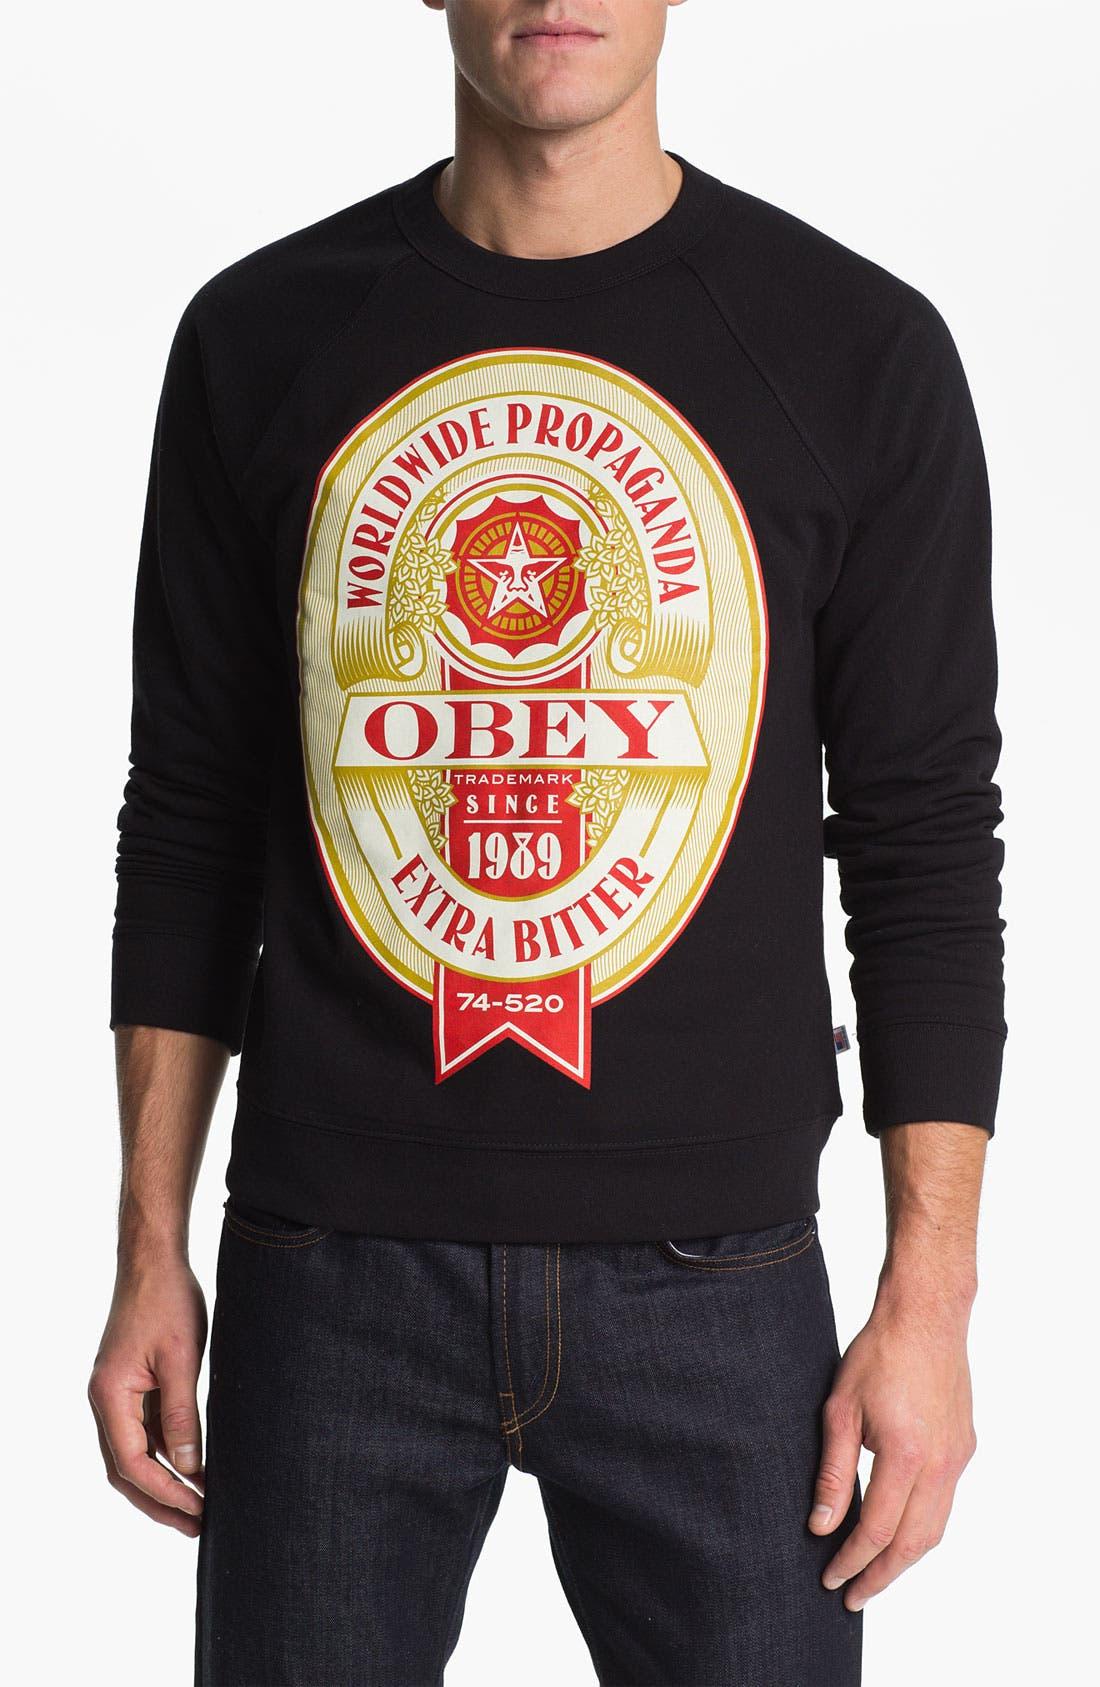 Alternate Image 1 Selected - Obey 'Extra Bitter' Crewneck Fleece Sweatshirt